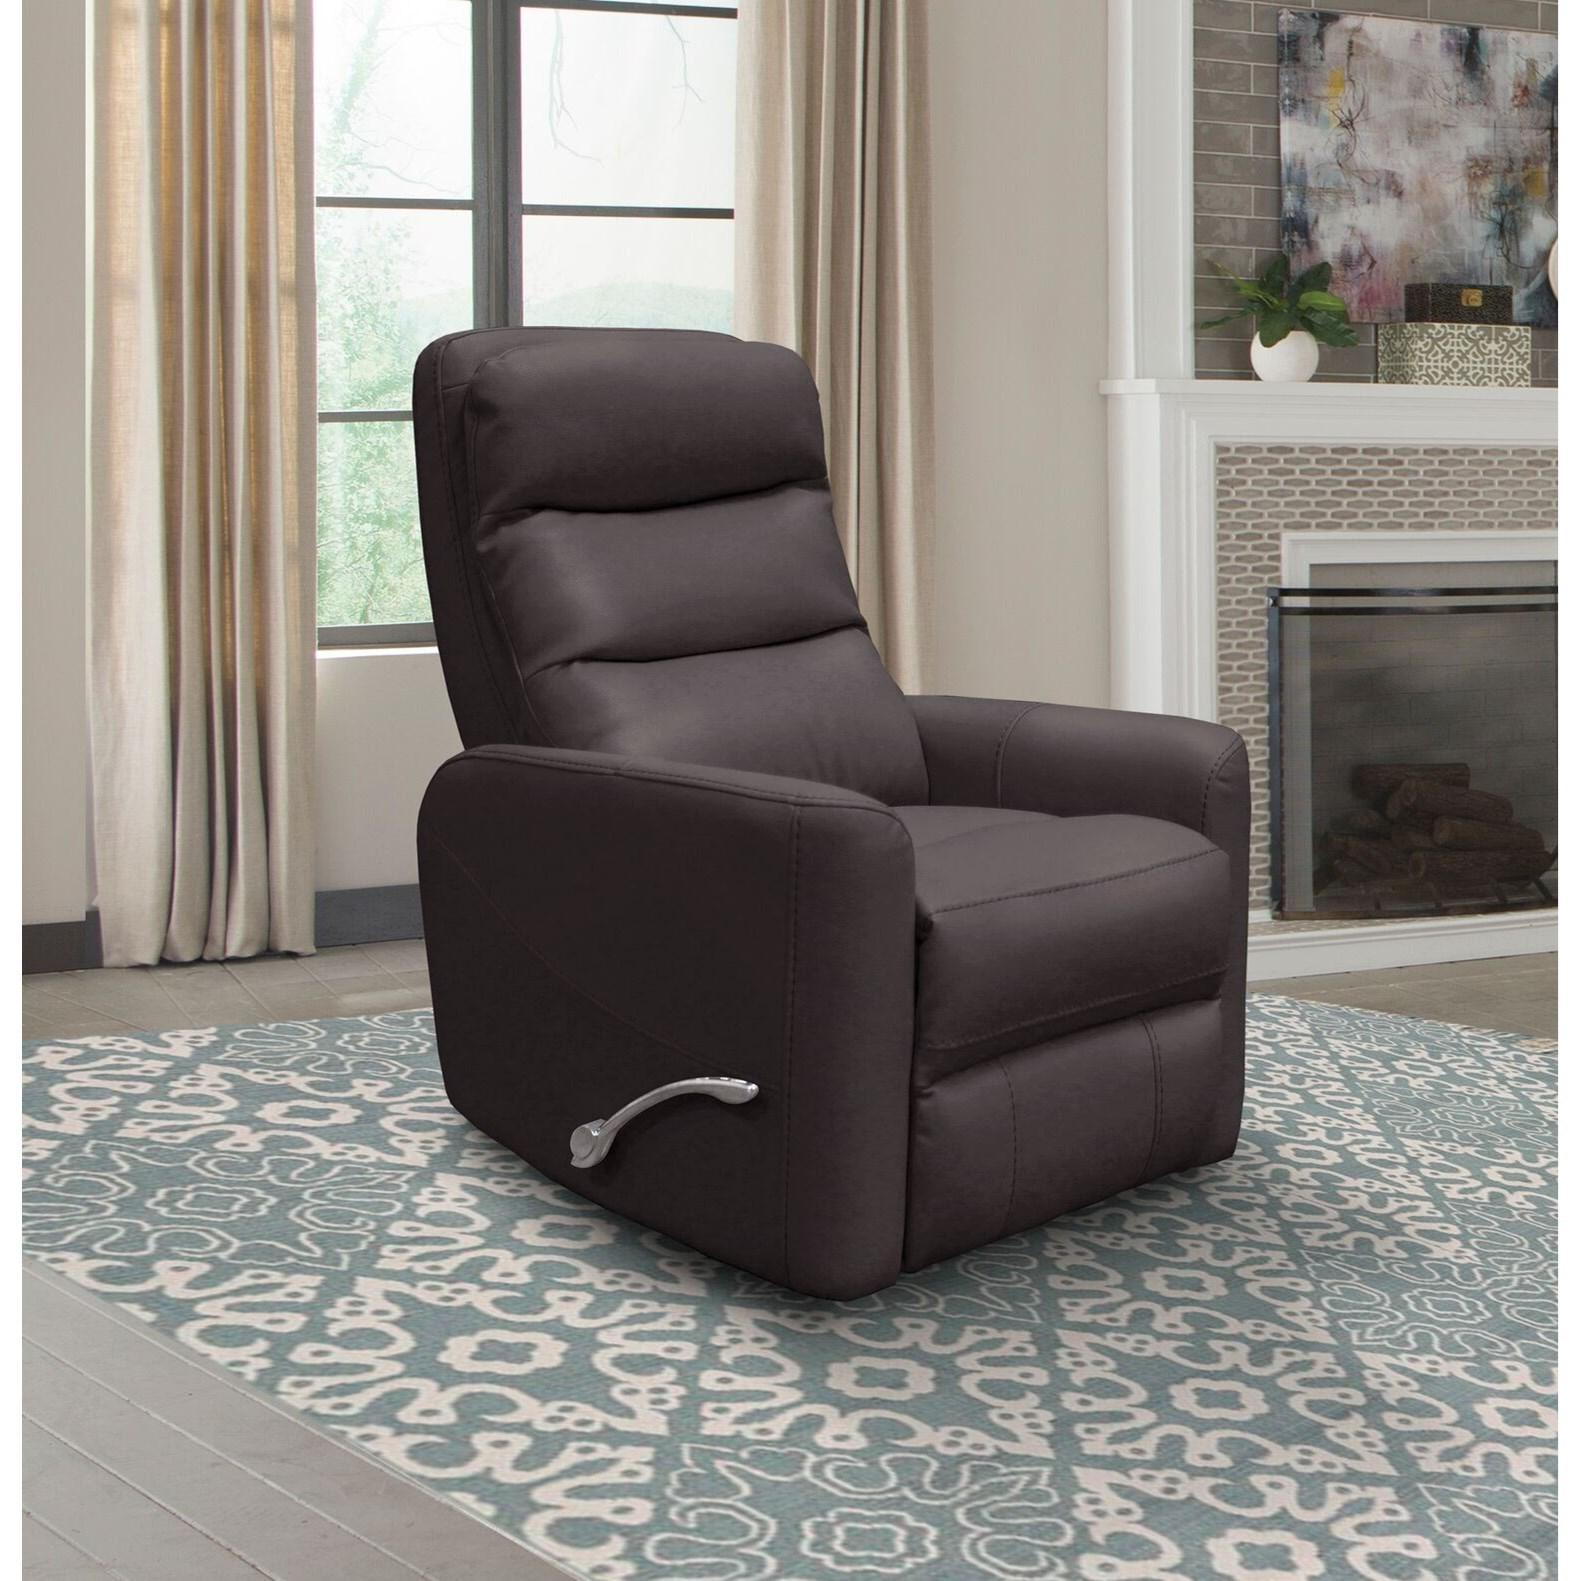 Leather Sofa Repair Ocala: Parker Living Hercules MHER#812GS-CHO Contemporary Swivel